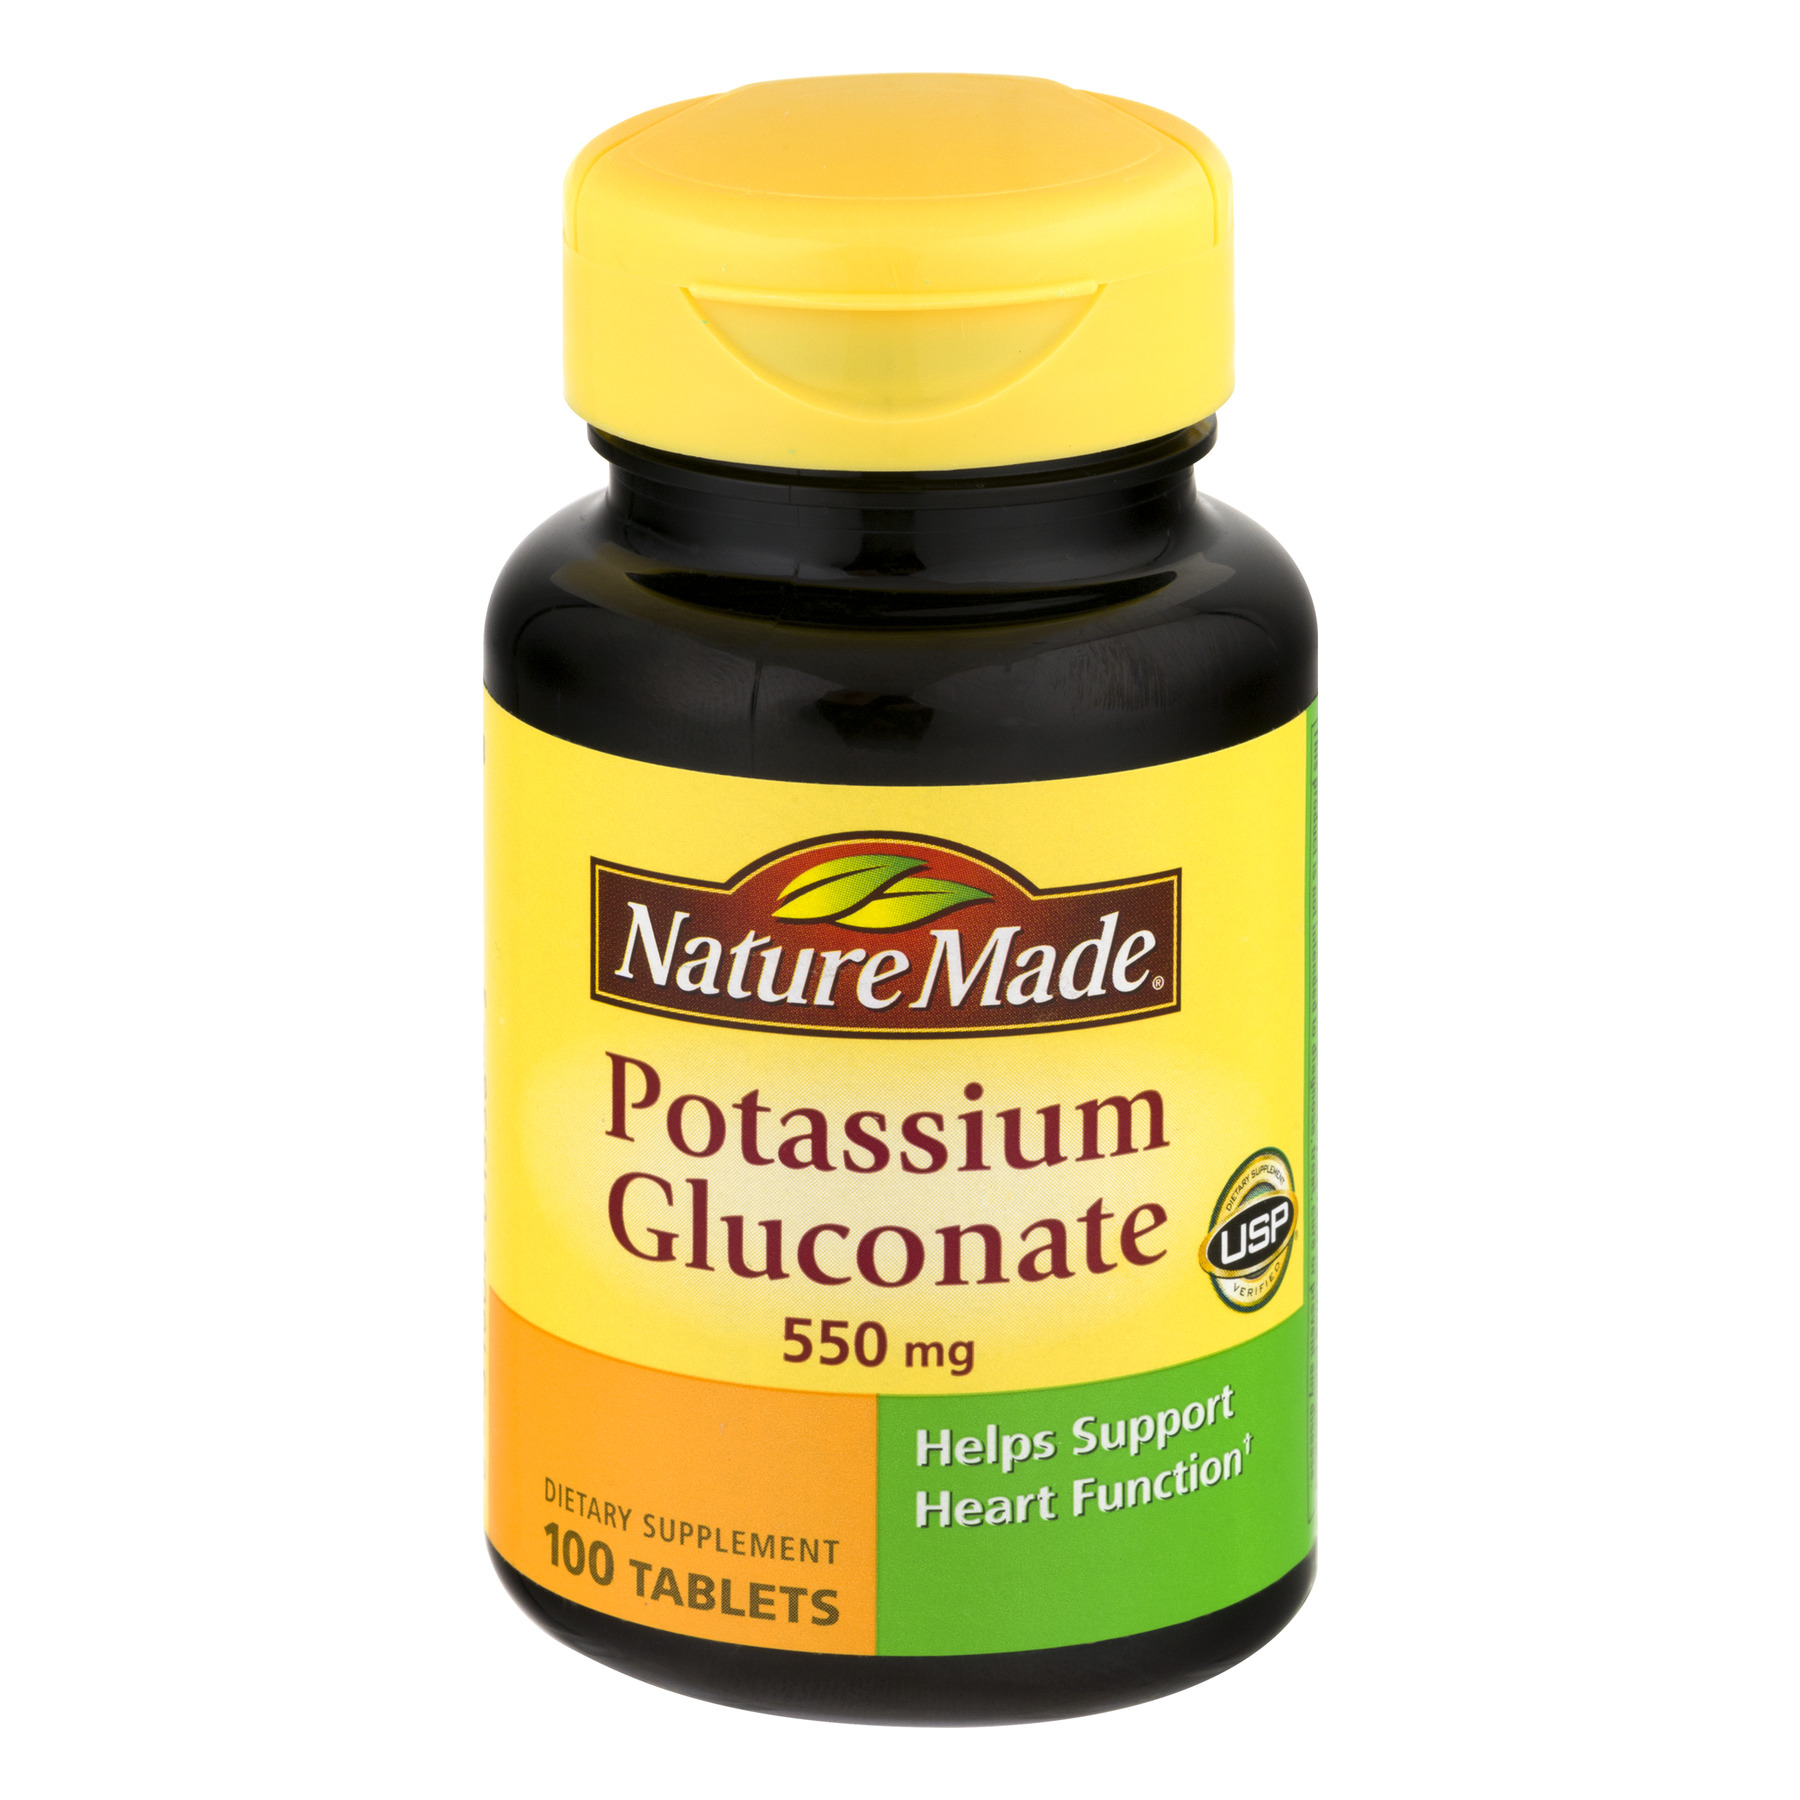 Nature Made Potassium Gluconate Tablets, 550 Mg, 100 Ct